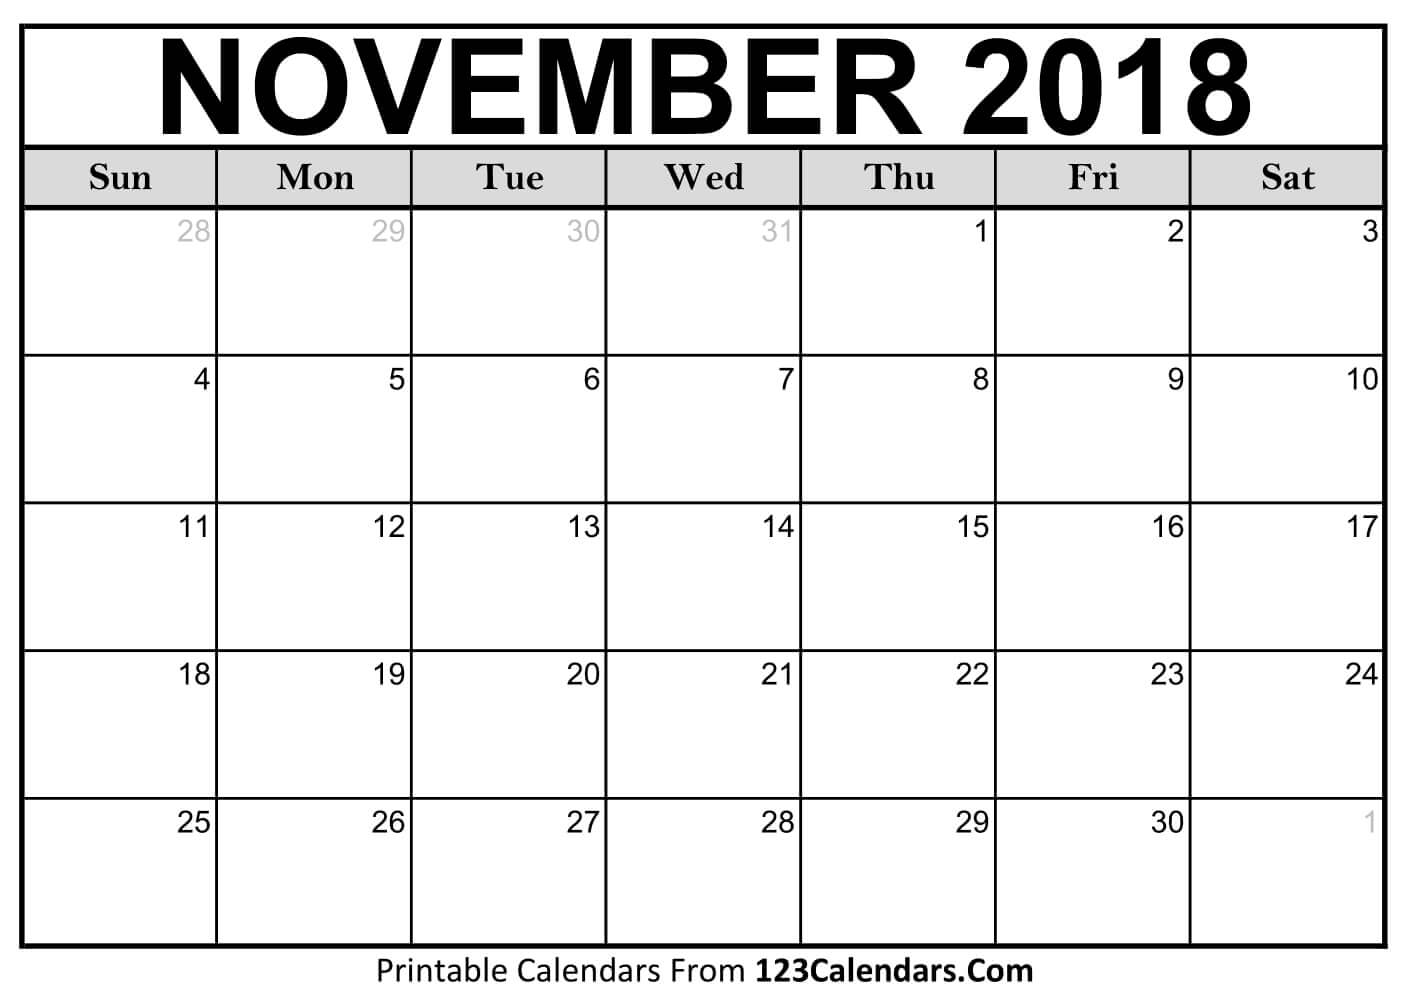 November 2018 Activity Calendar